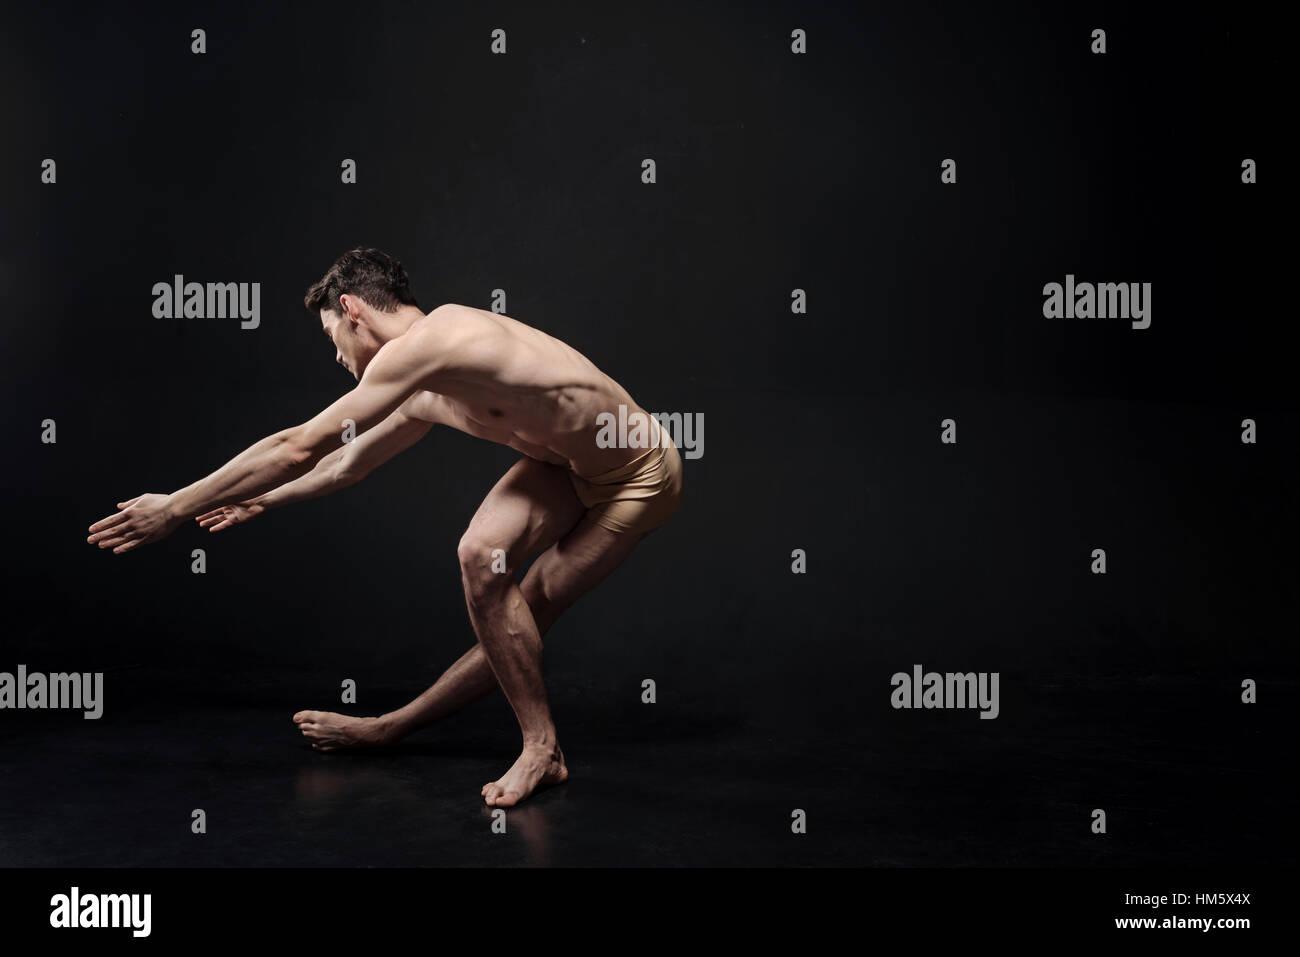 Artistic ballet dancer performing in the studio - Stock Image